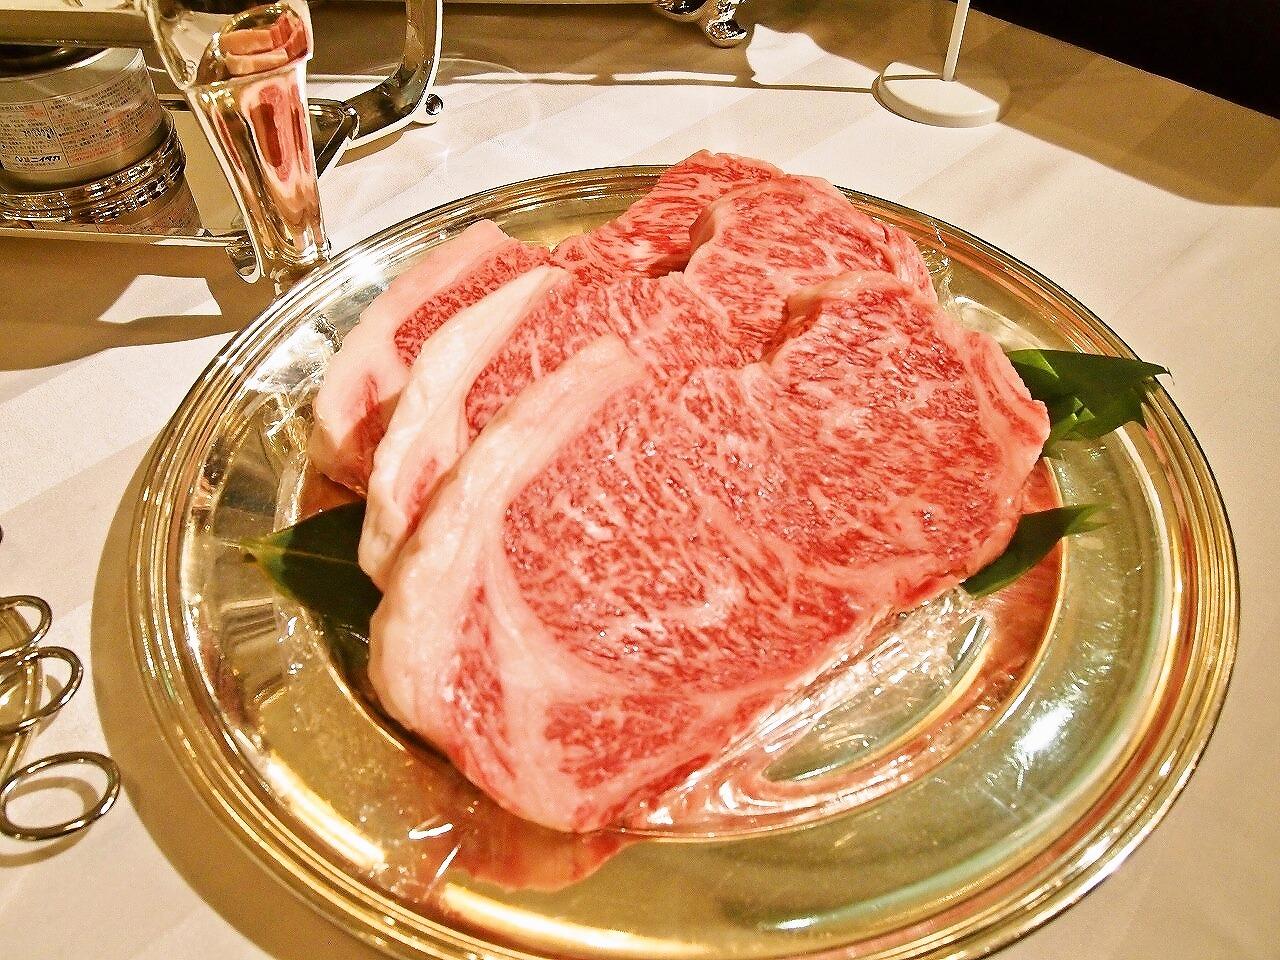 s-foodpic7478873.jpg